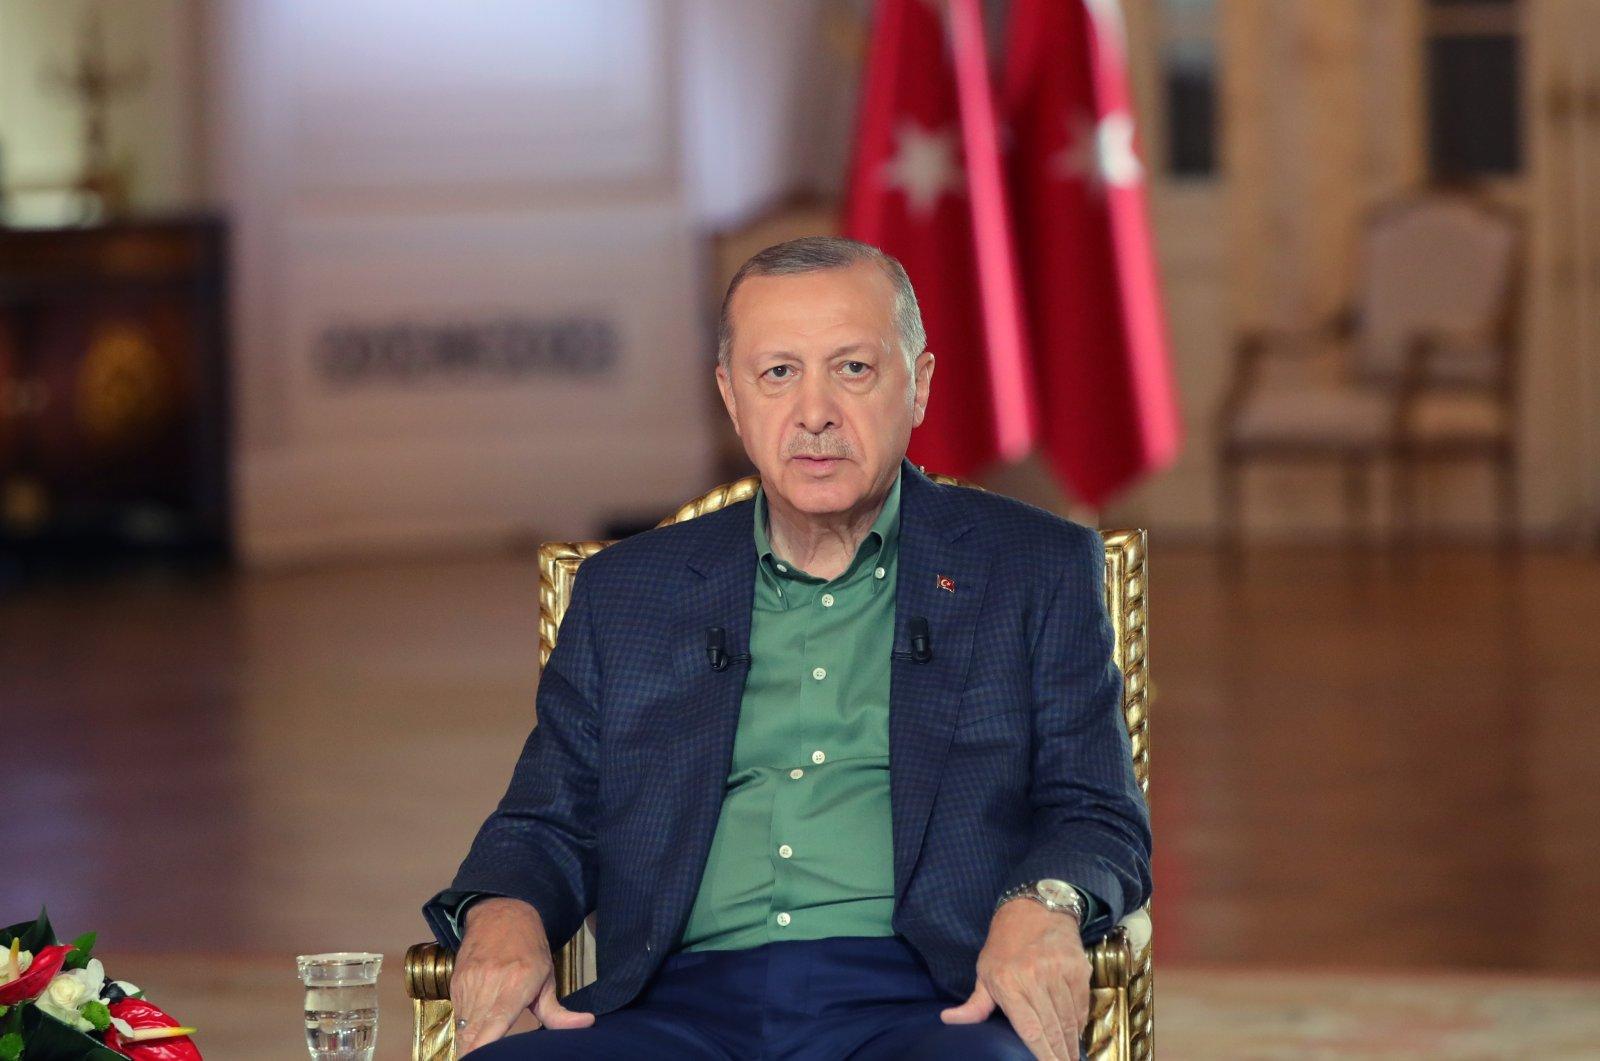 President Recep Tayyip Erdoğan listens during a televised broadcast on ATV/A Haber news channels at Ankara's Çankaya Mansion, Turkey, Aug. 4, 2021 (AA Photo)